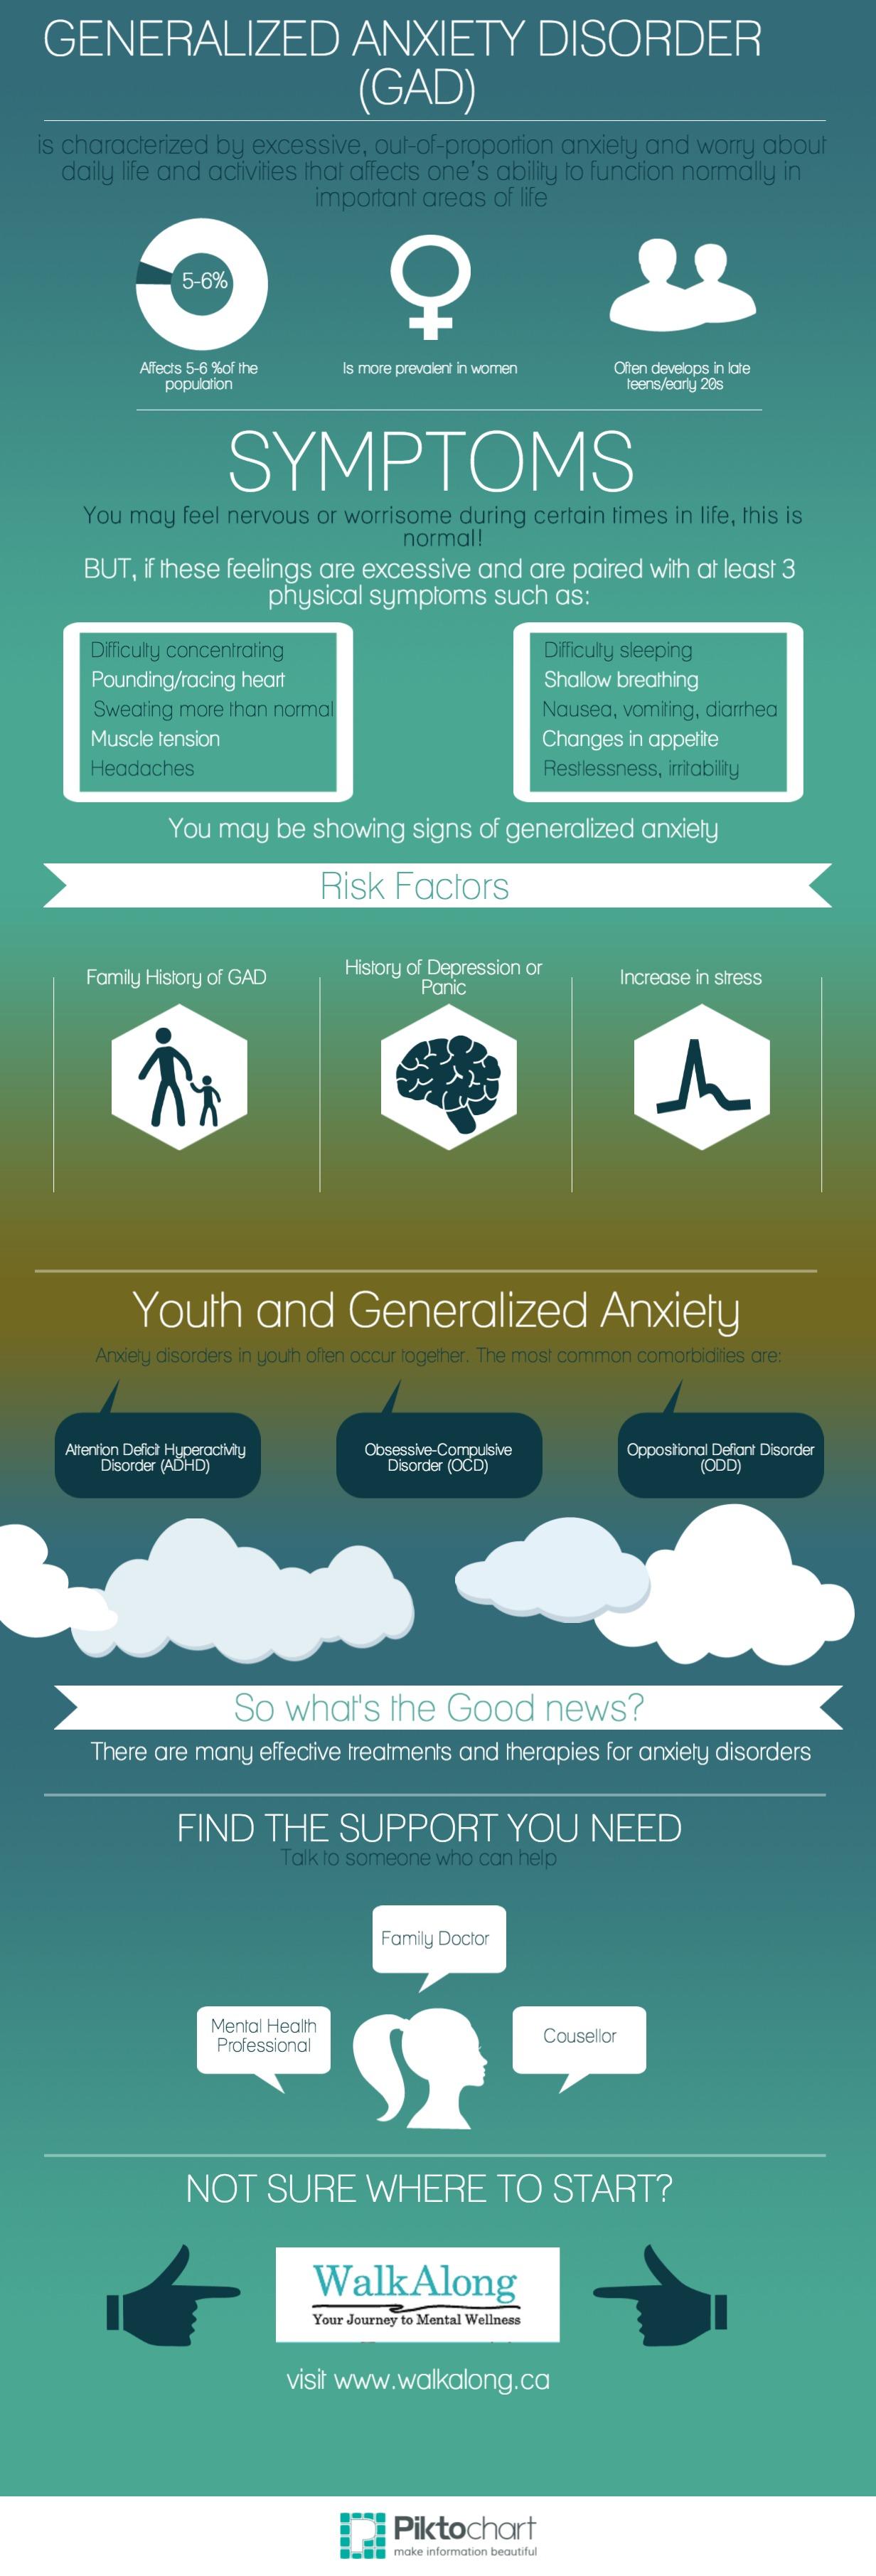 Generalized Anxiety Disorder (GAD) | Walk Along